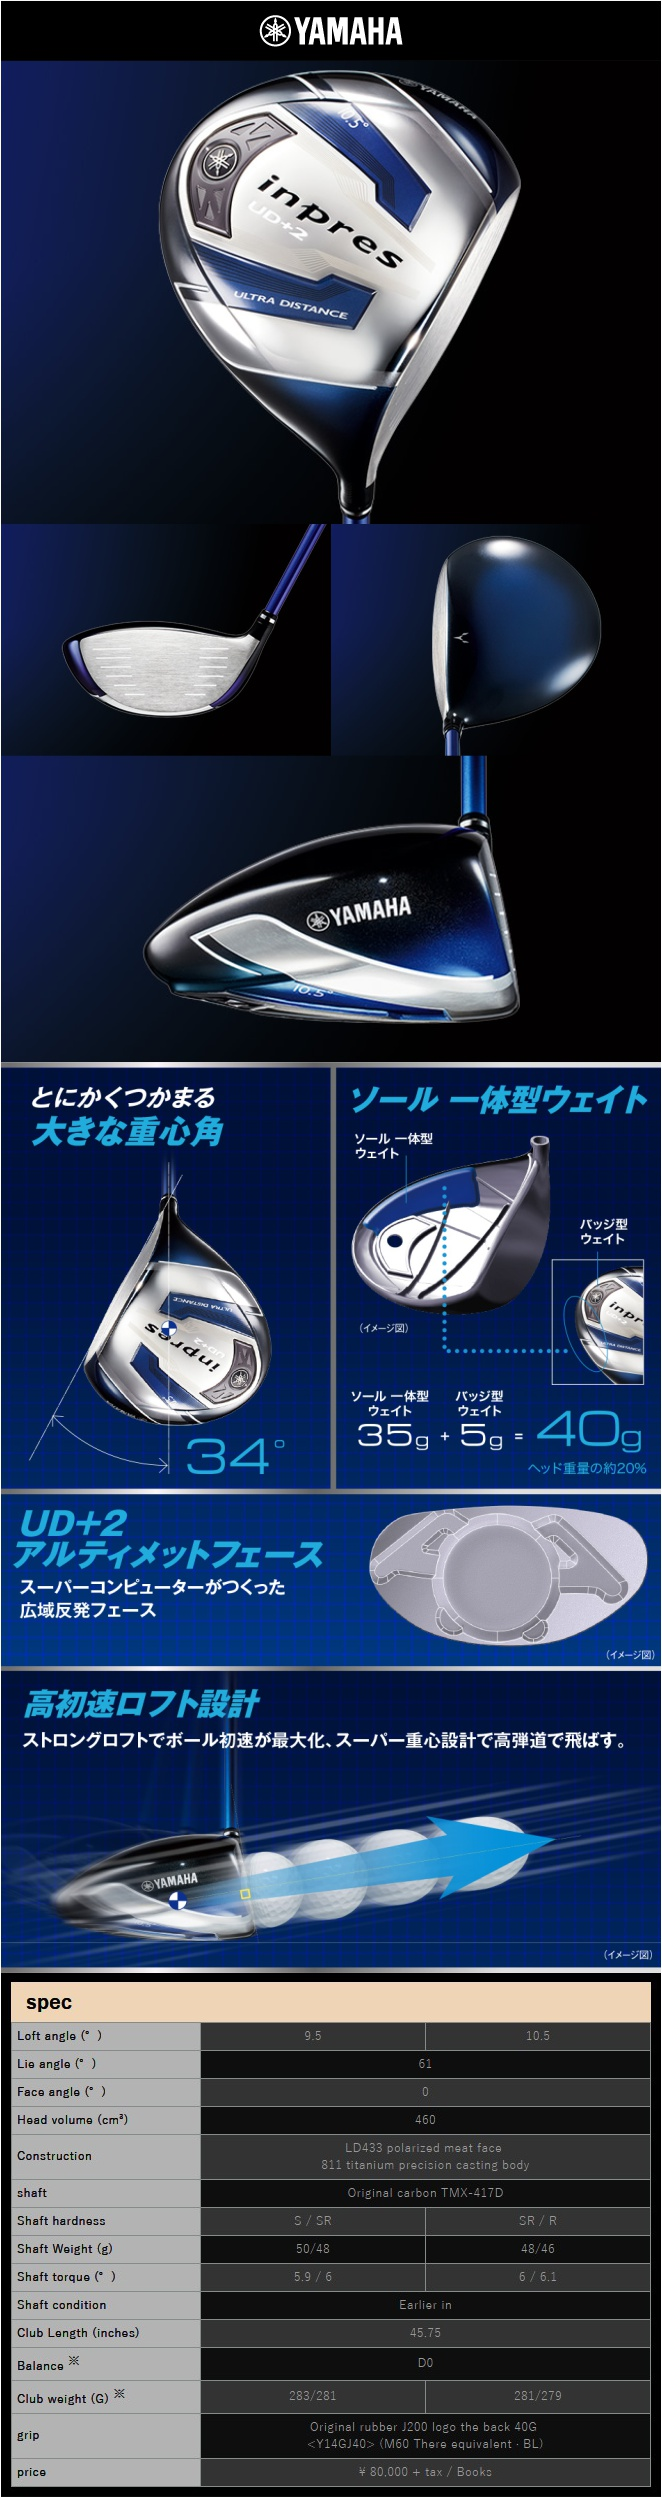 Yamaha Inpres UD+2 Driver